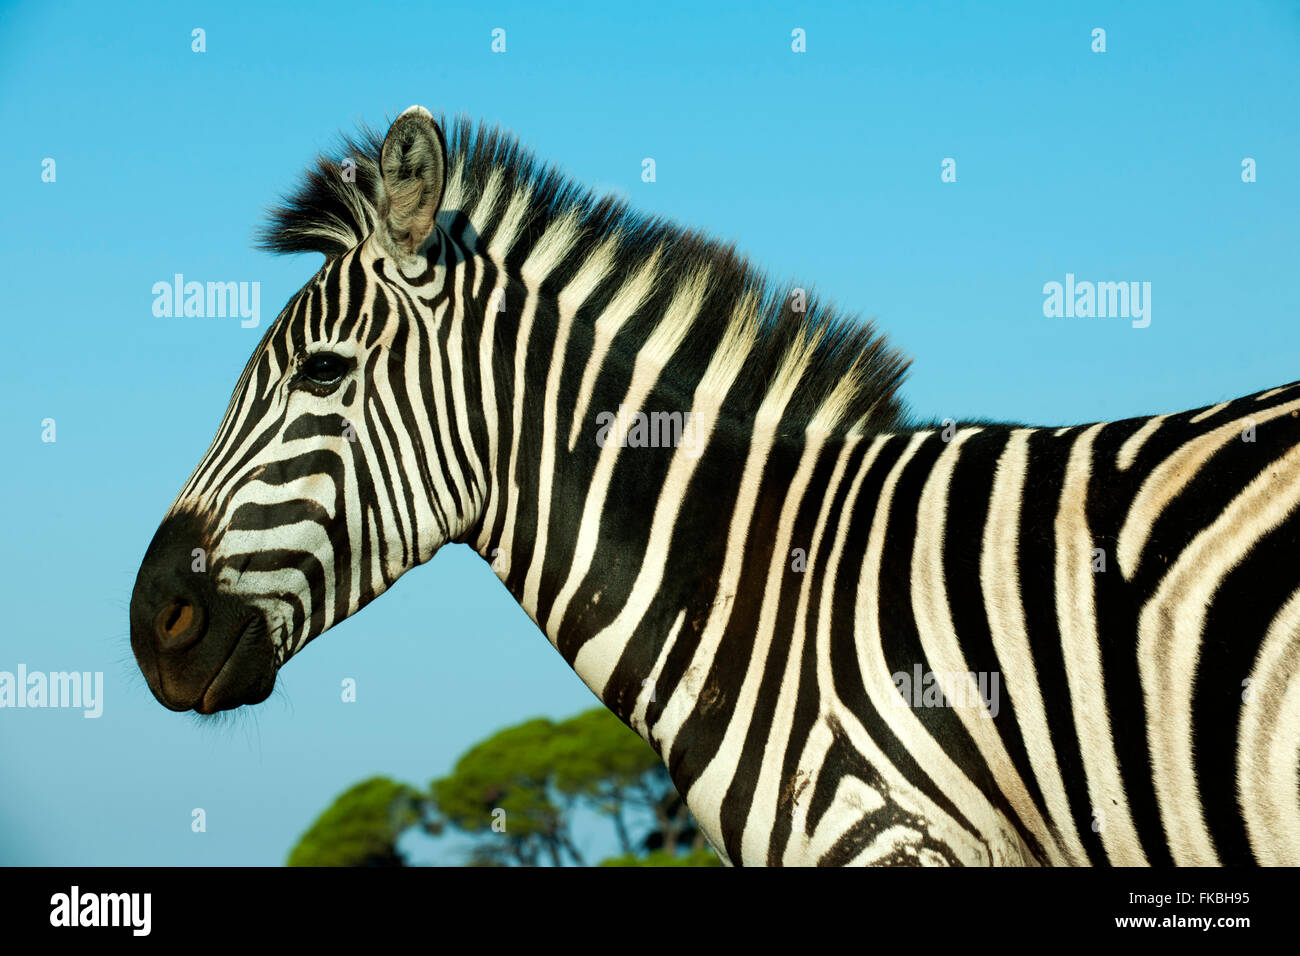 Kroatien, Istrien, Insel Veli Brijuni im Nationalpark Brijuni-Inseln vor Pula. Steppenzebra (Equus quagga) oder Stockbild